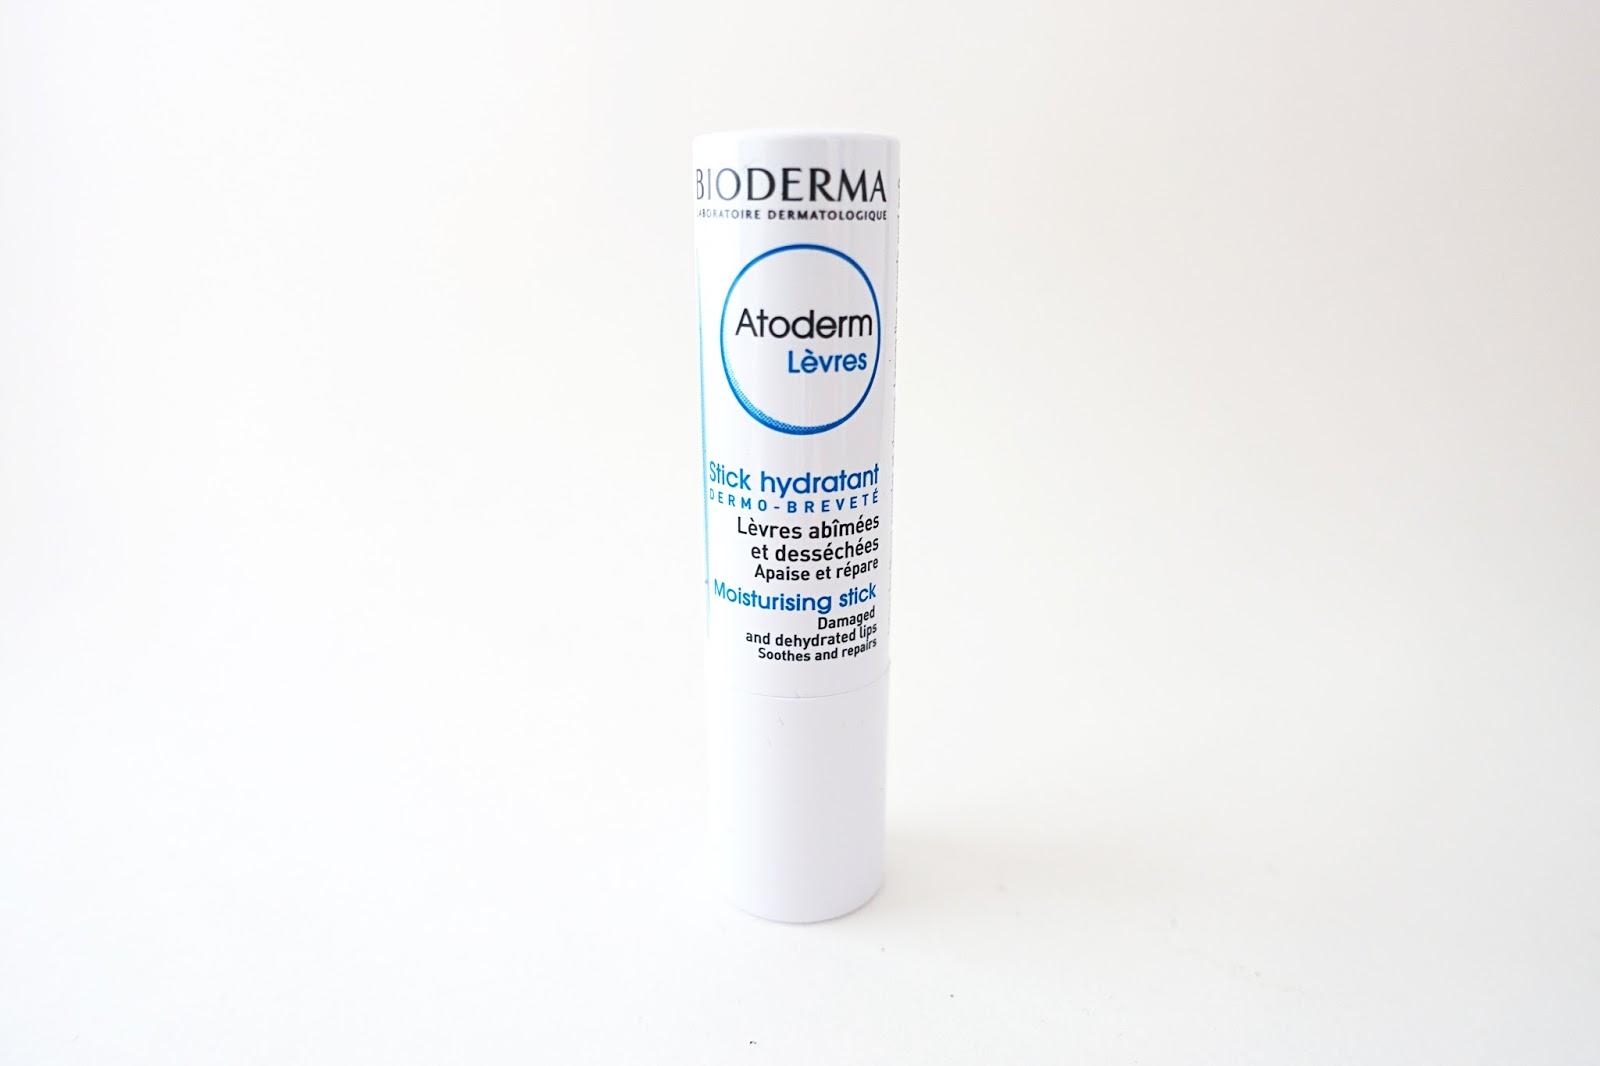 bioderma, bioderma atoderm, bioderma lip balm, bioderma hydrating lip balm